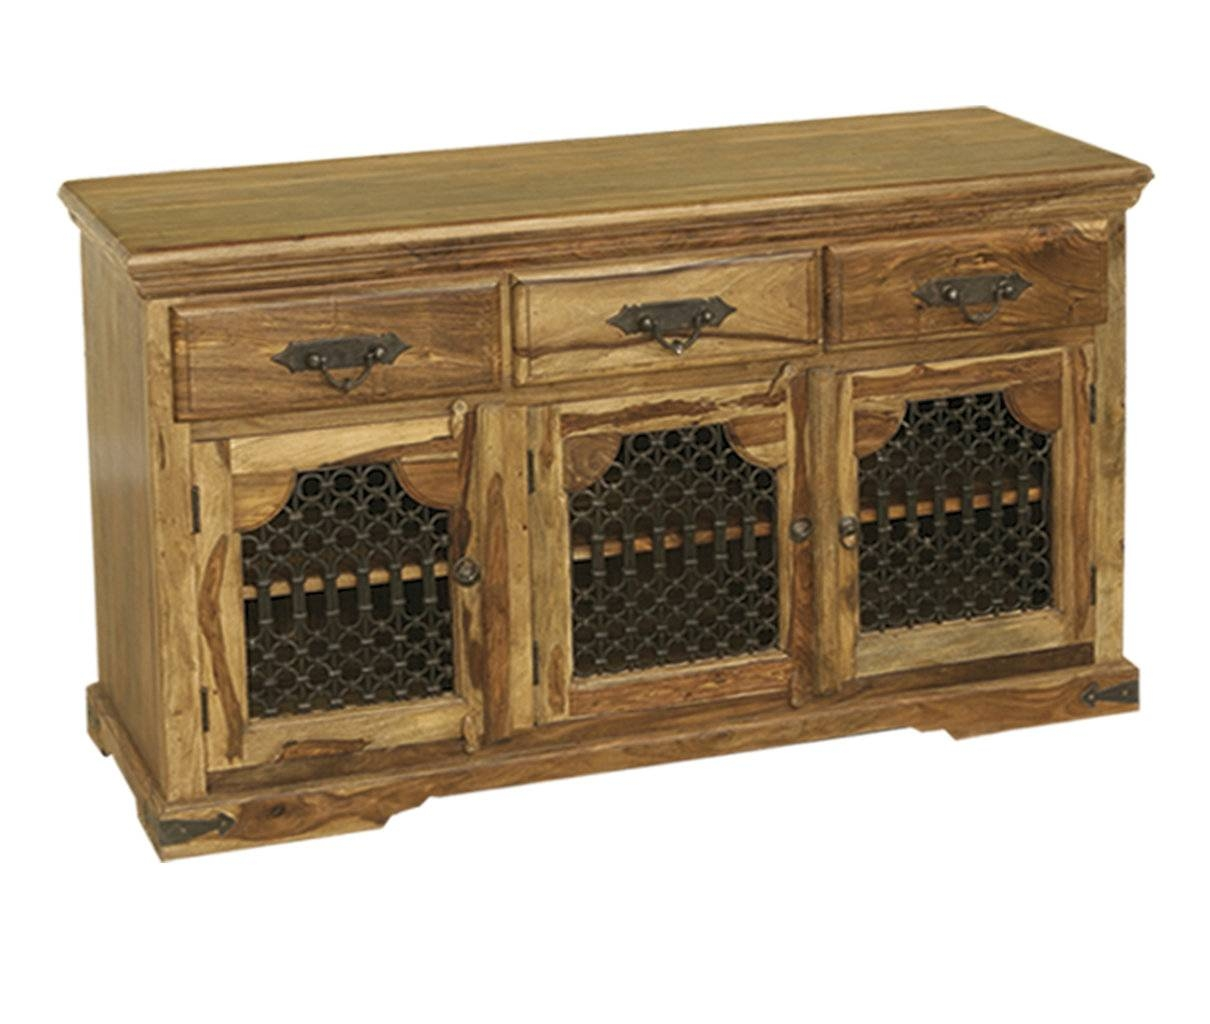 Bali Sheesham Indian Wood Furniture 3 Door Sideboard Cabinet regarding Indian Sideboard Furniture (Image 1 of 15)